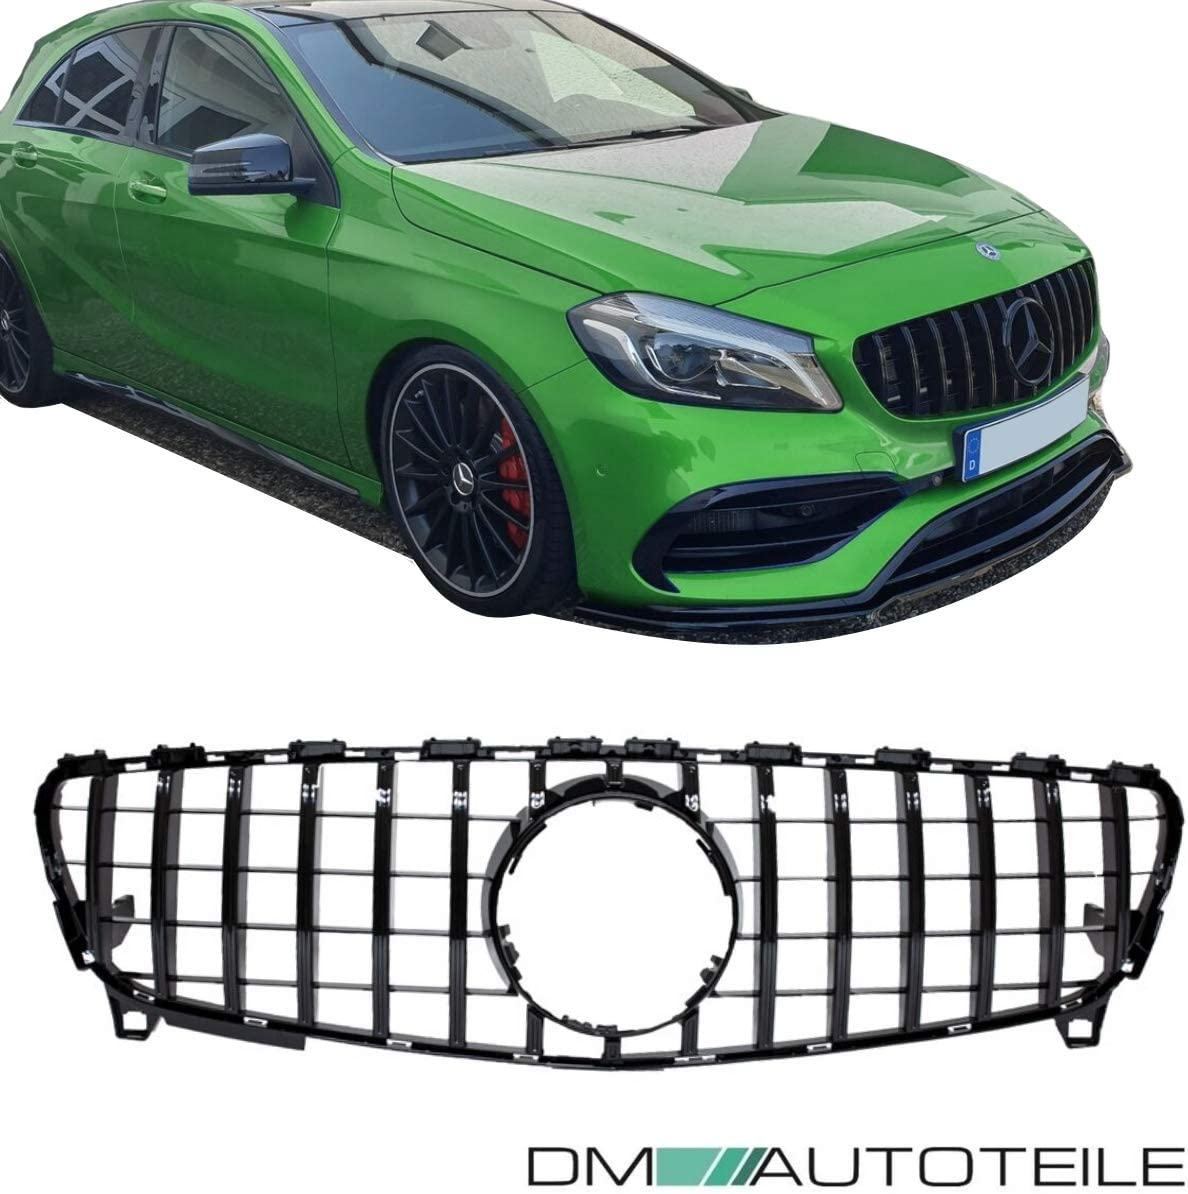 DM Autoteile Sport-Panamericana K/ühlergrill Schwarz passend f/ür W176 Mopf 15-19